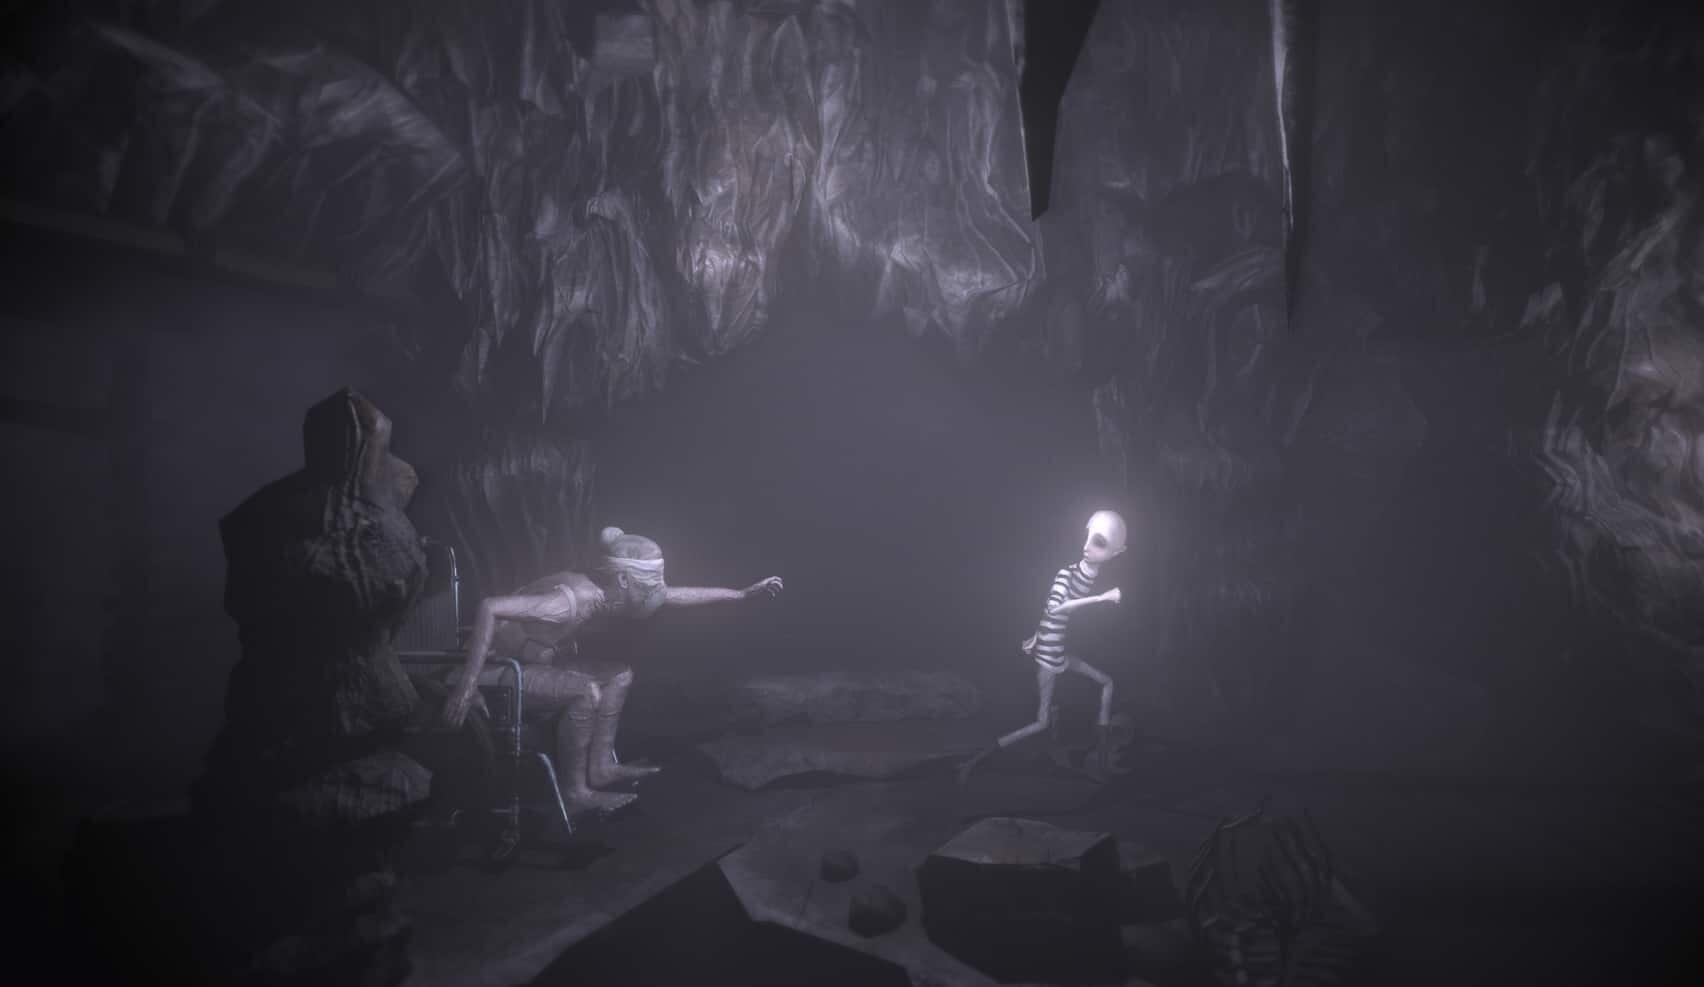 Darq game screenshot